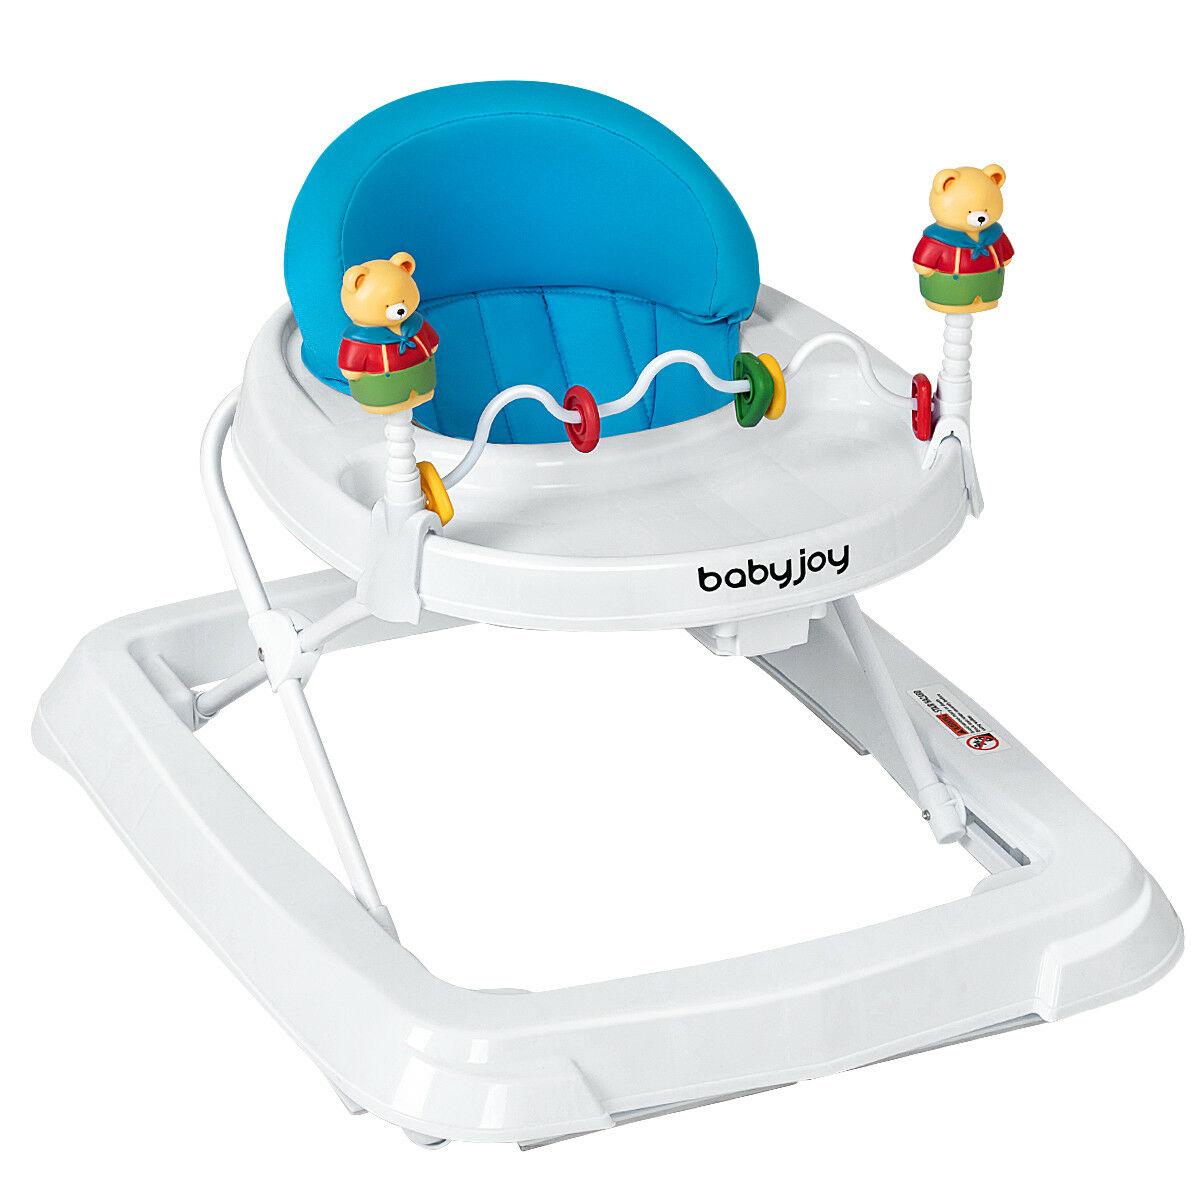 Andador portátil para bebés niños aprende a caminar carrito de juguete altura ajustable azul